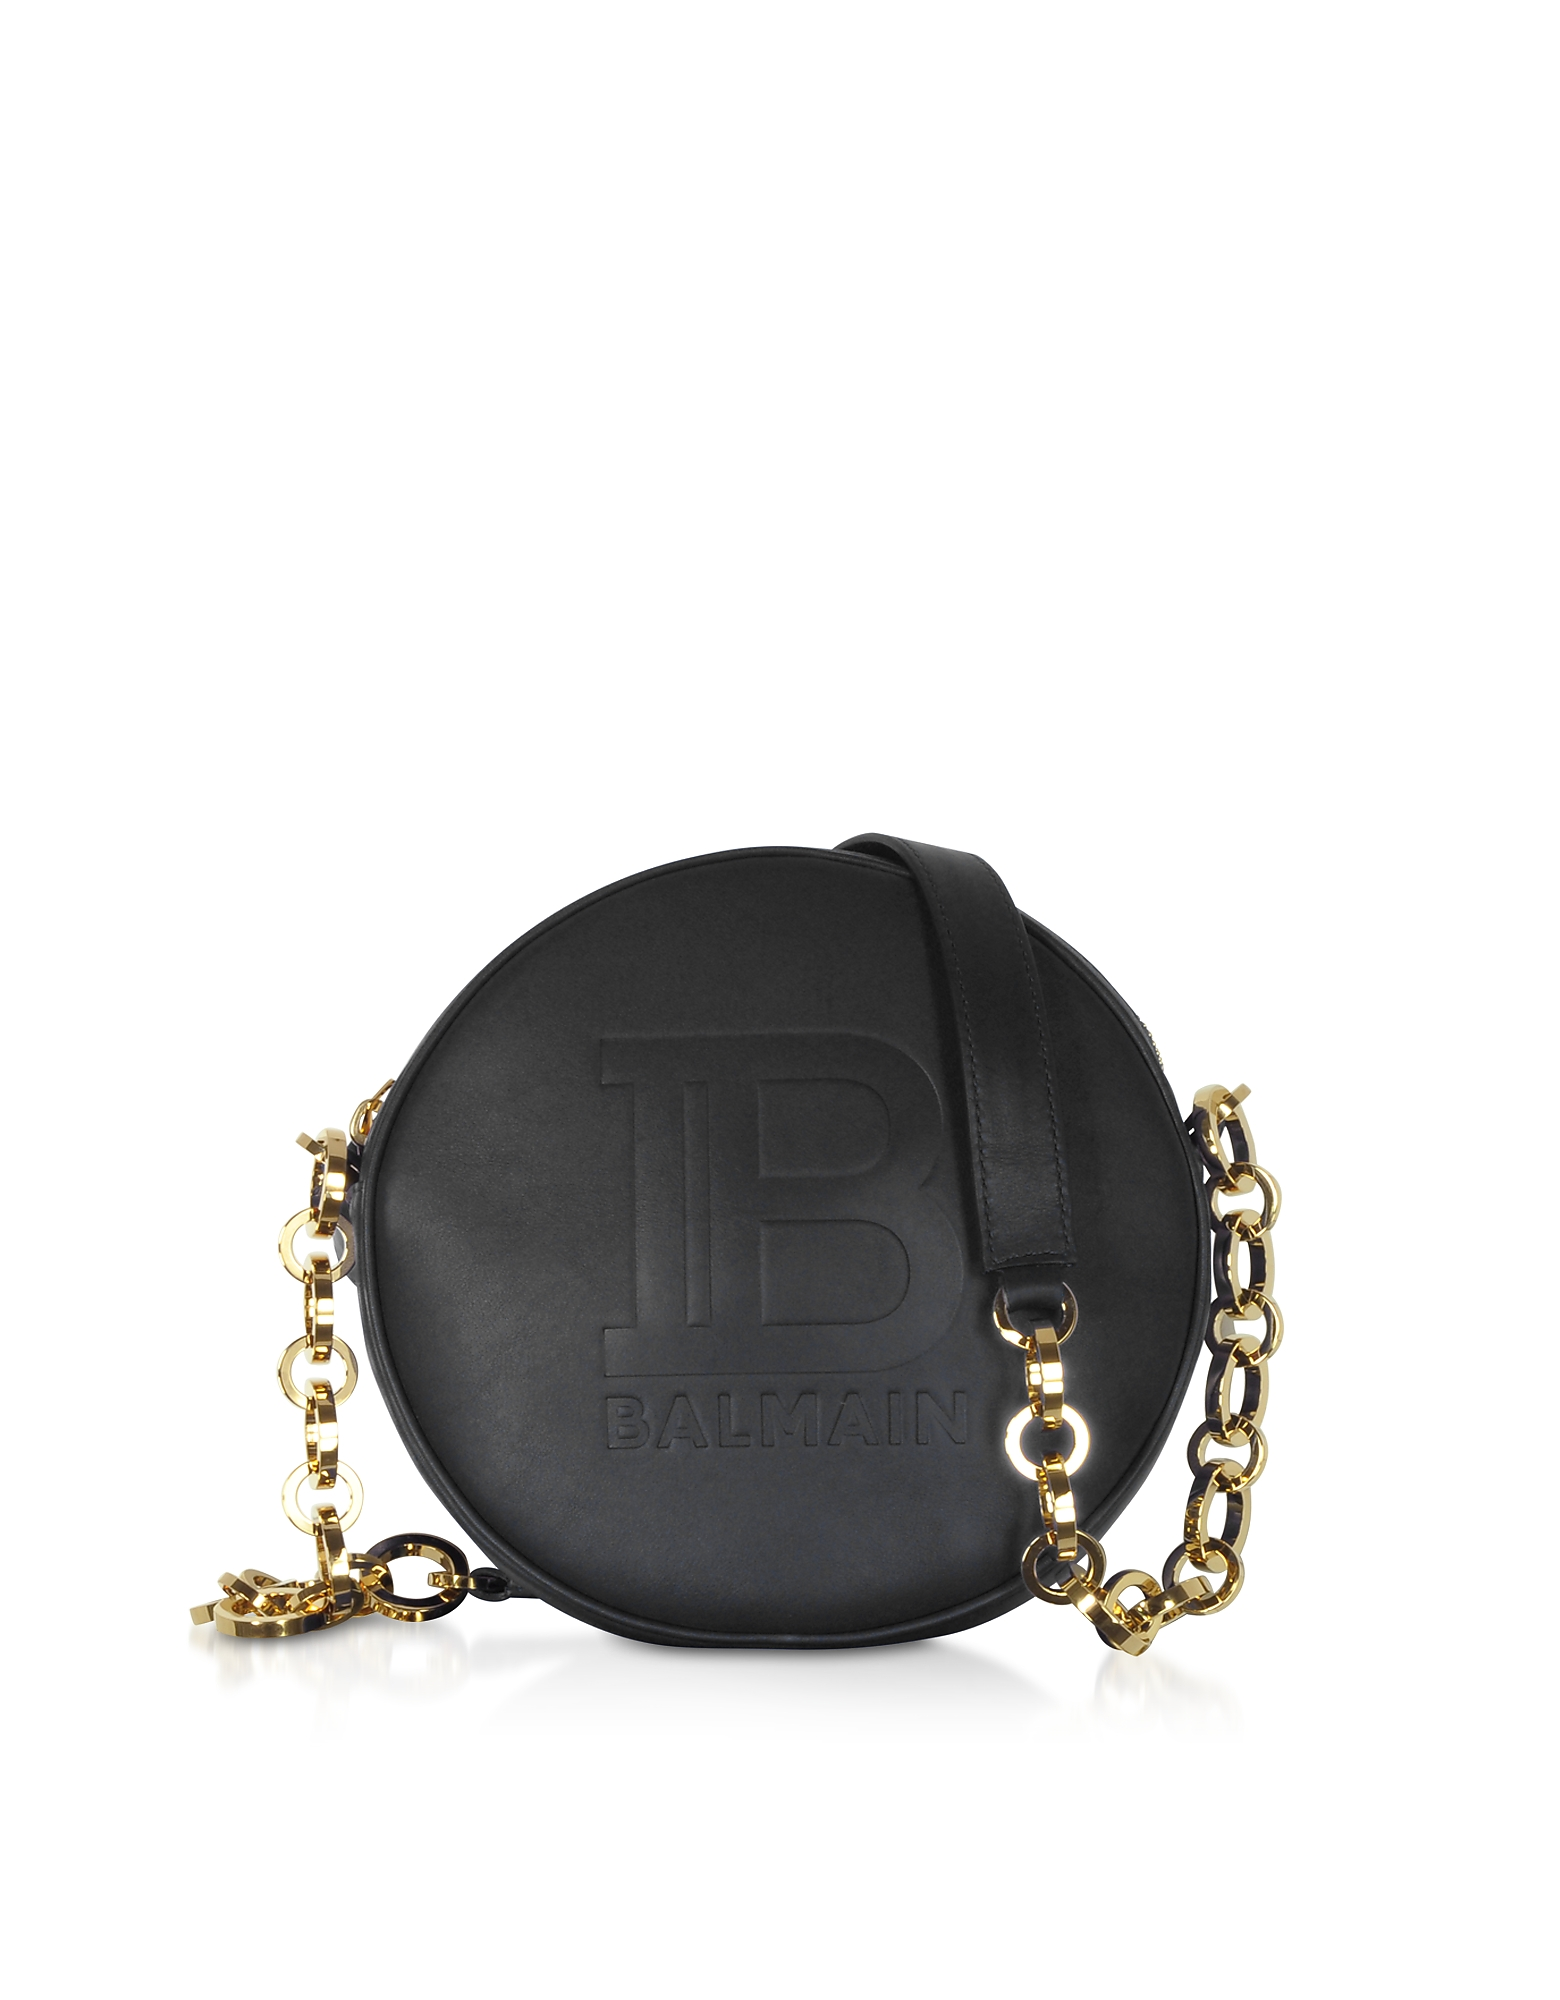 Balmain  Handbags Mini Disco Shoulder Bag